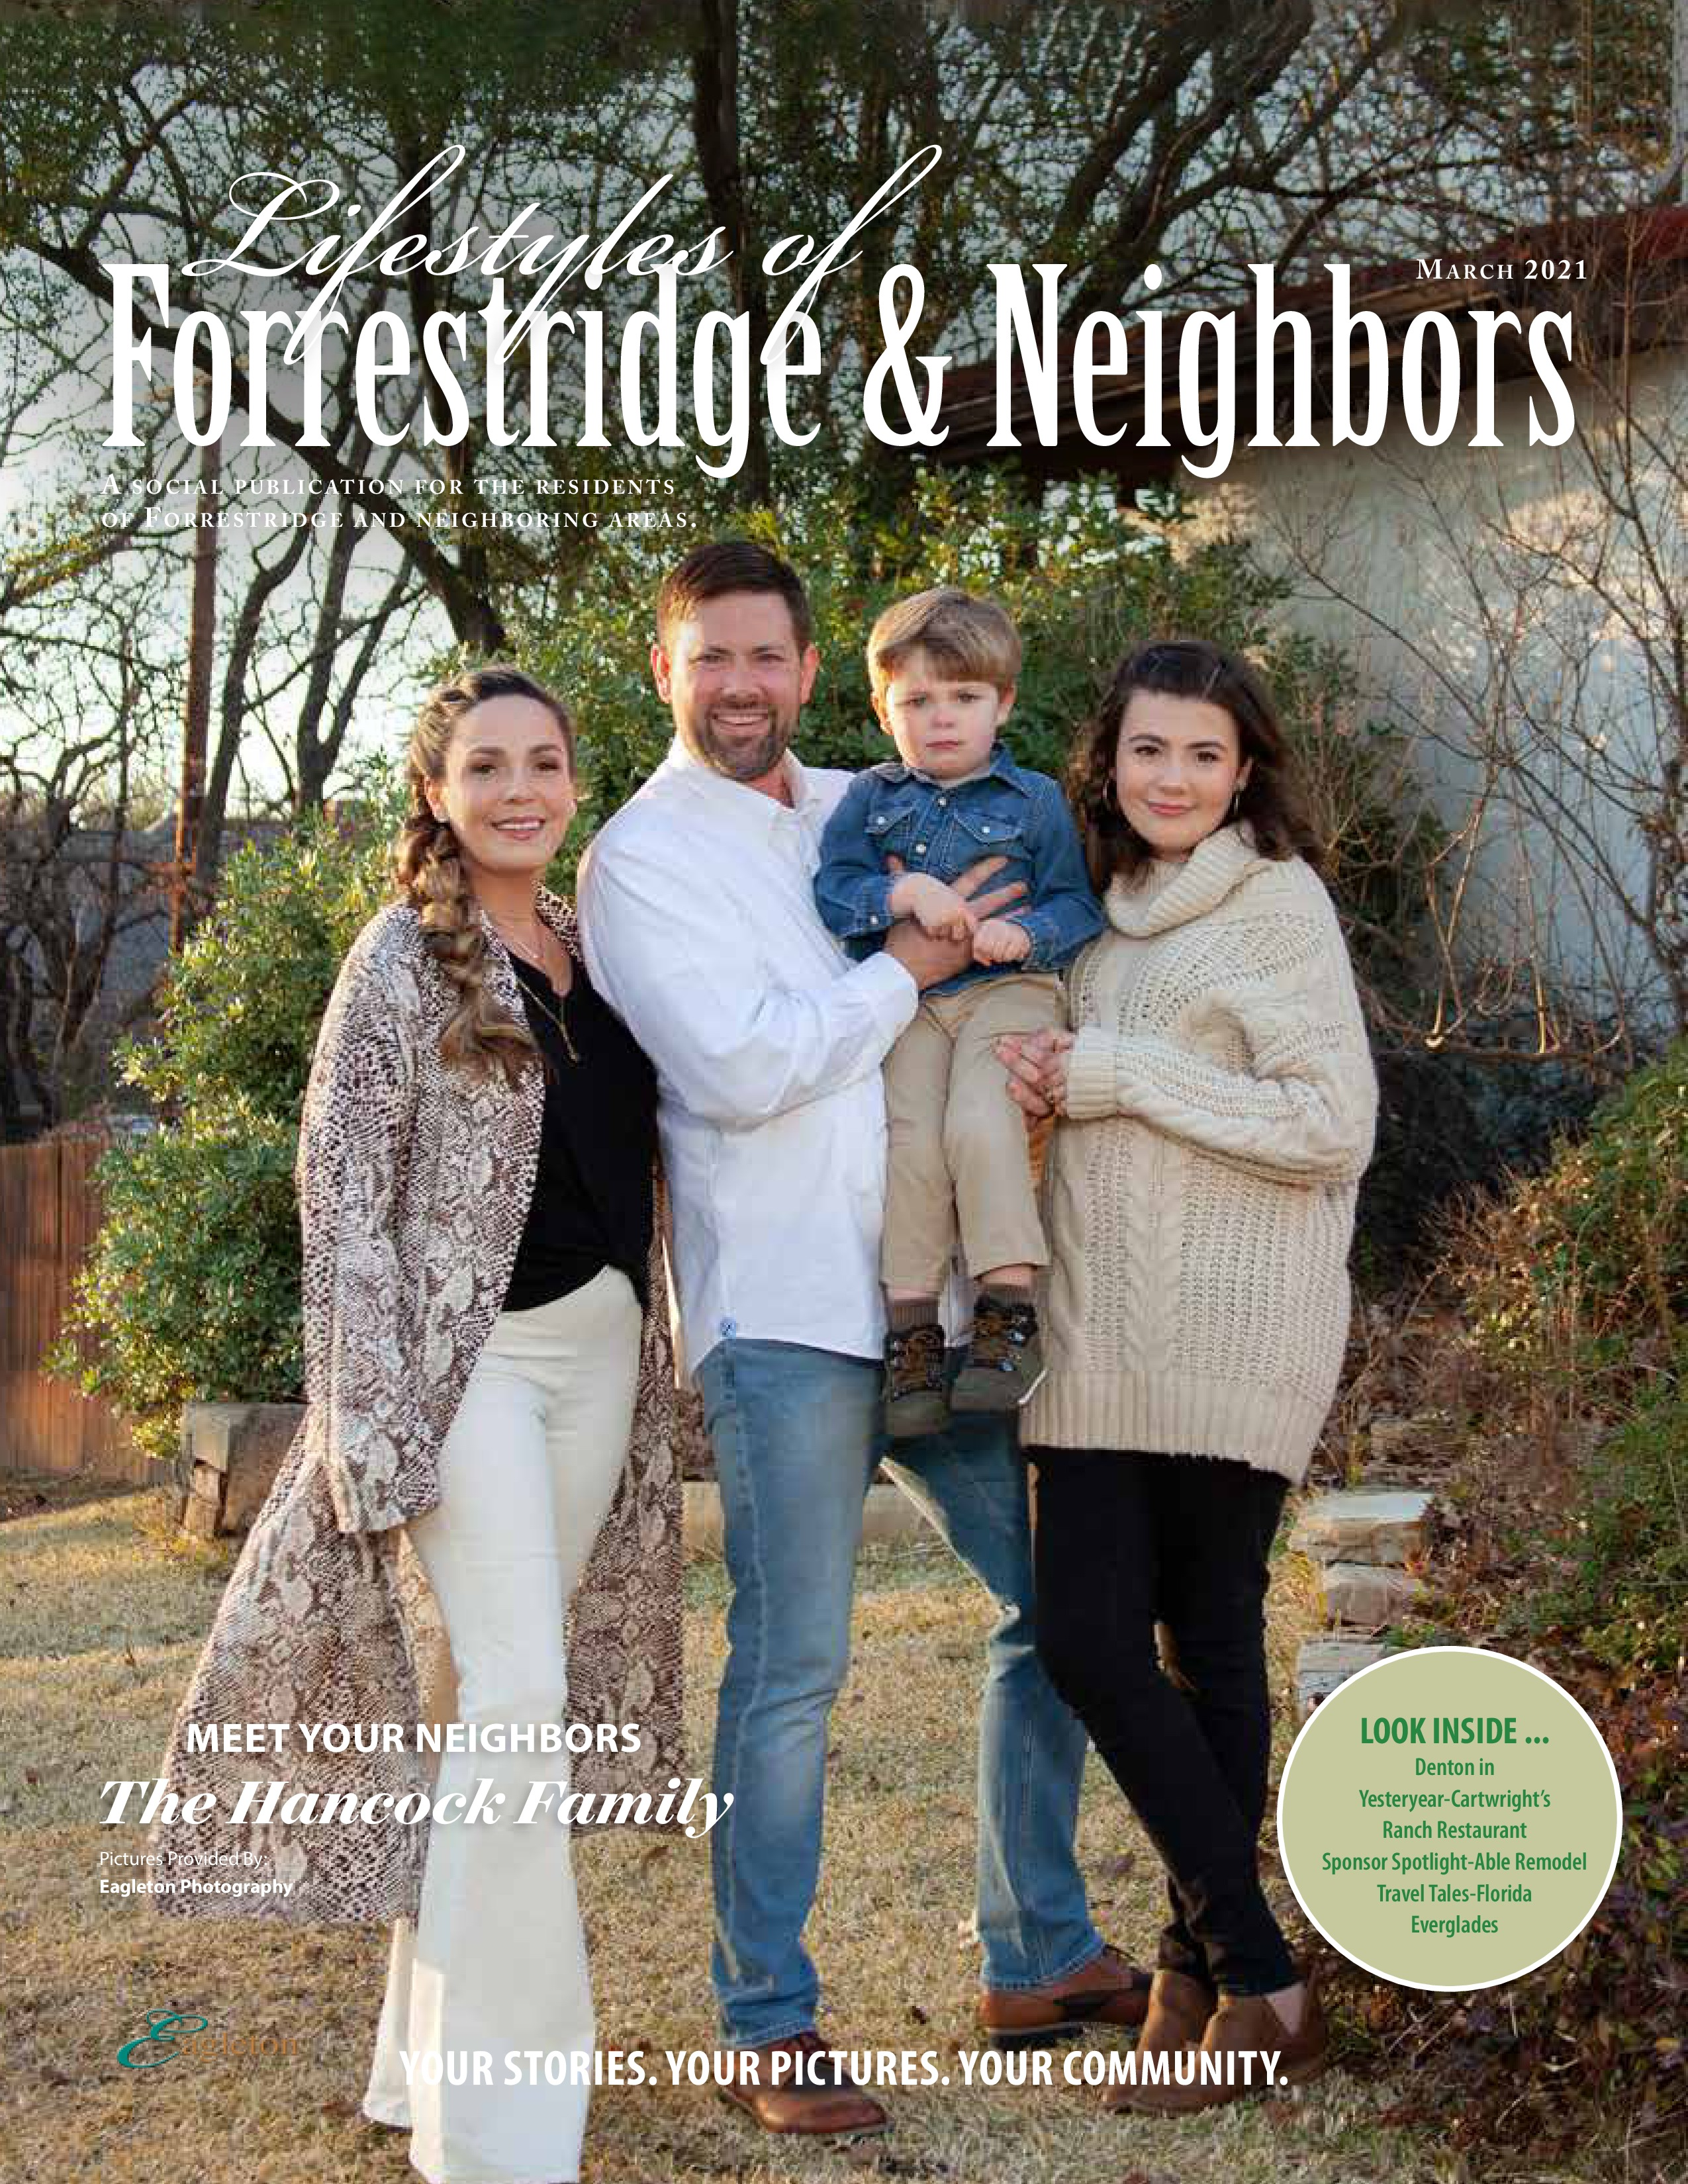 Lifestyles of Forrestridge and Neighbors 2021-03-01